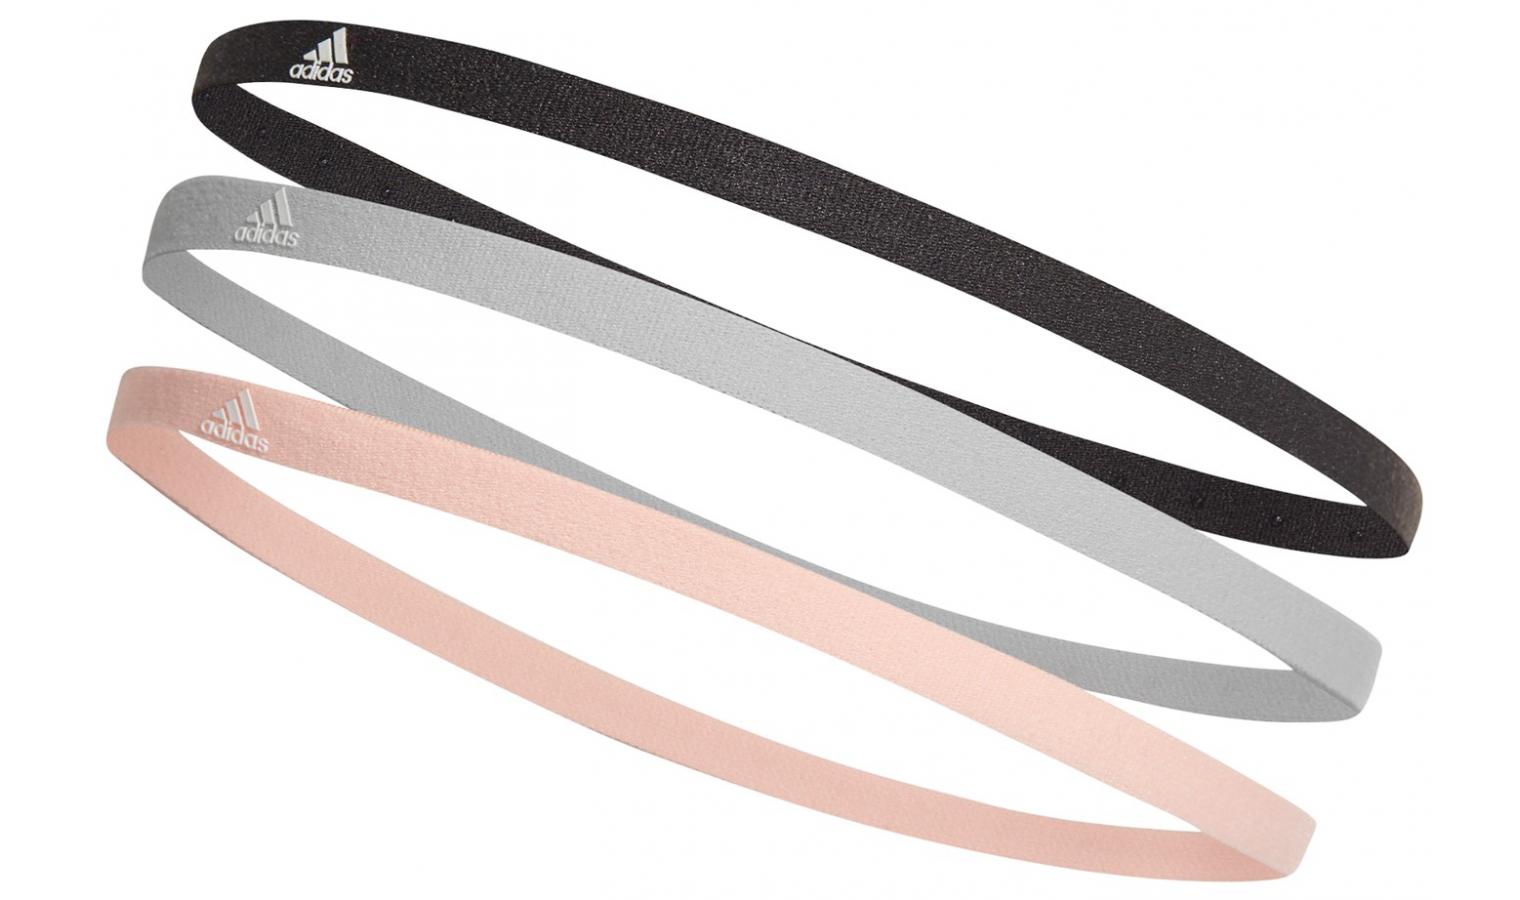 a4d7ad58bc7 Čelenka adidas 3PP HAIRBAND černá šedá růžová